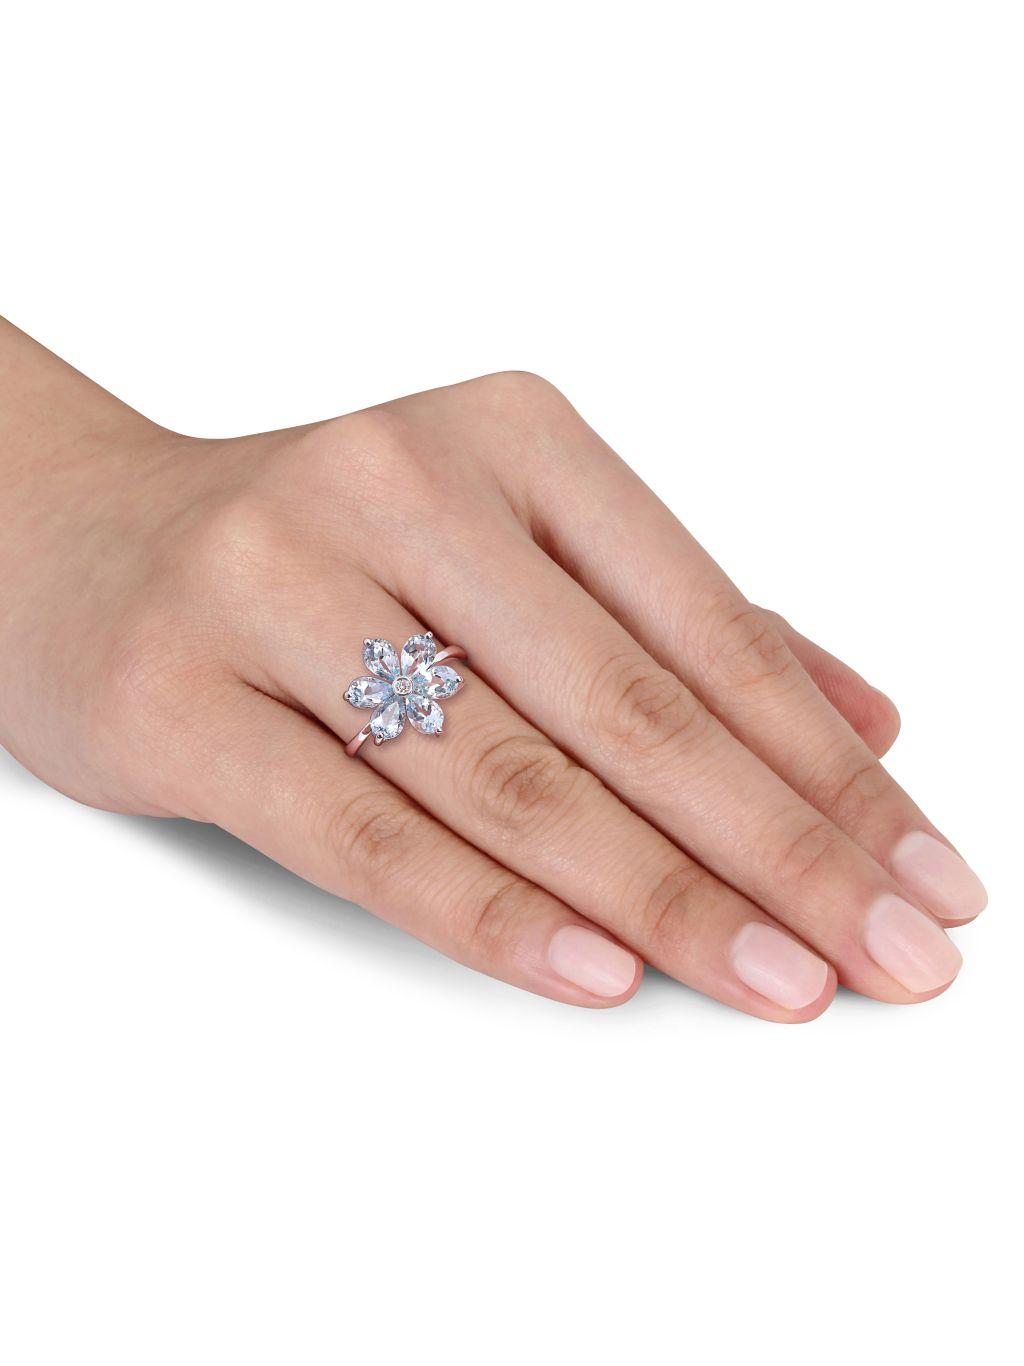 Sonatina 14K White Gold, Aquamarine & Diamond Flower Ring